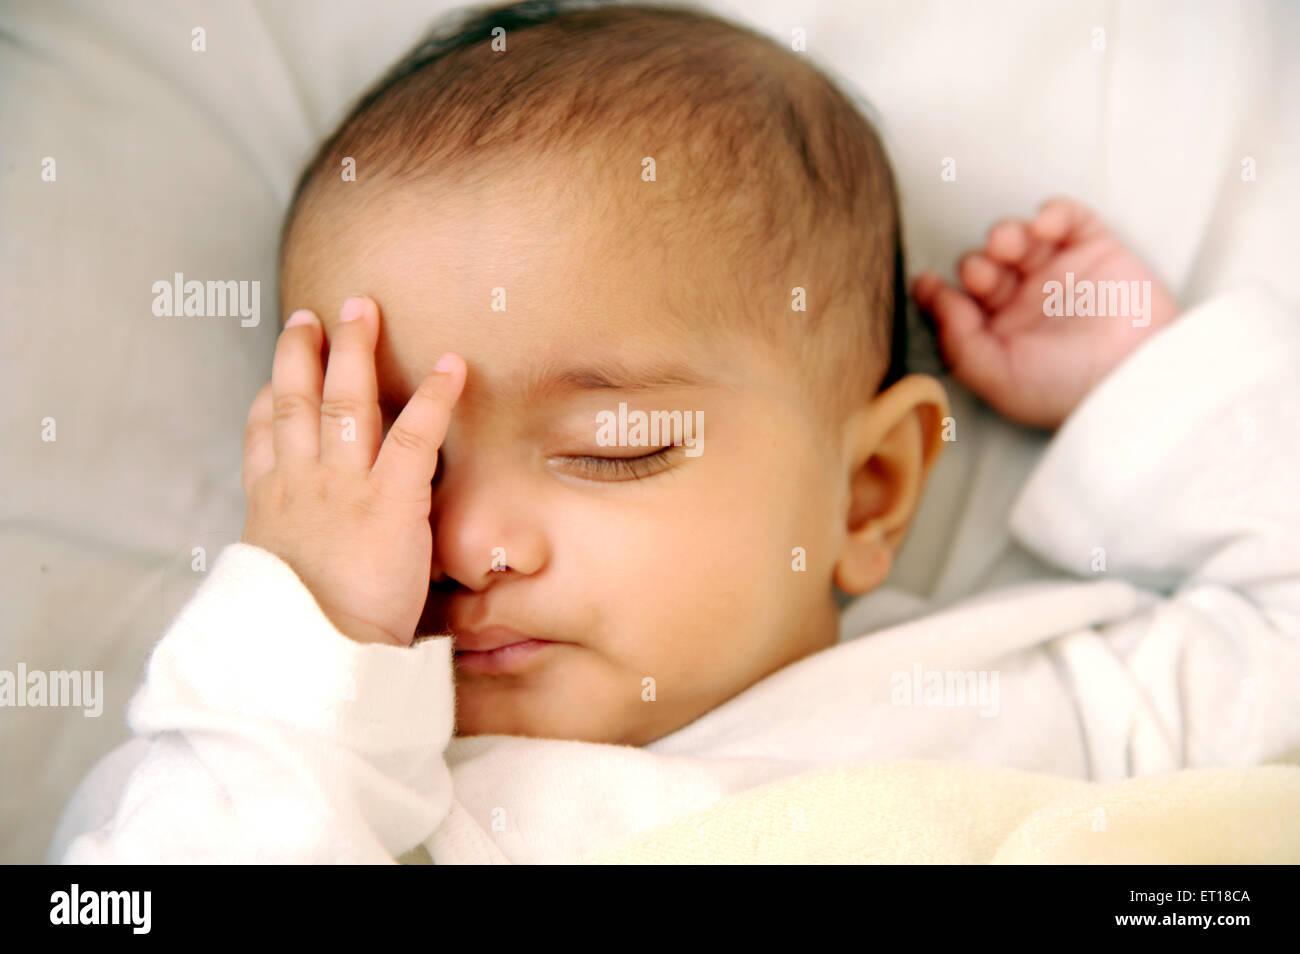 Indian Baby Boy Child Sleeping Hand On Eyes Mr 736la Stock Photo Alamy